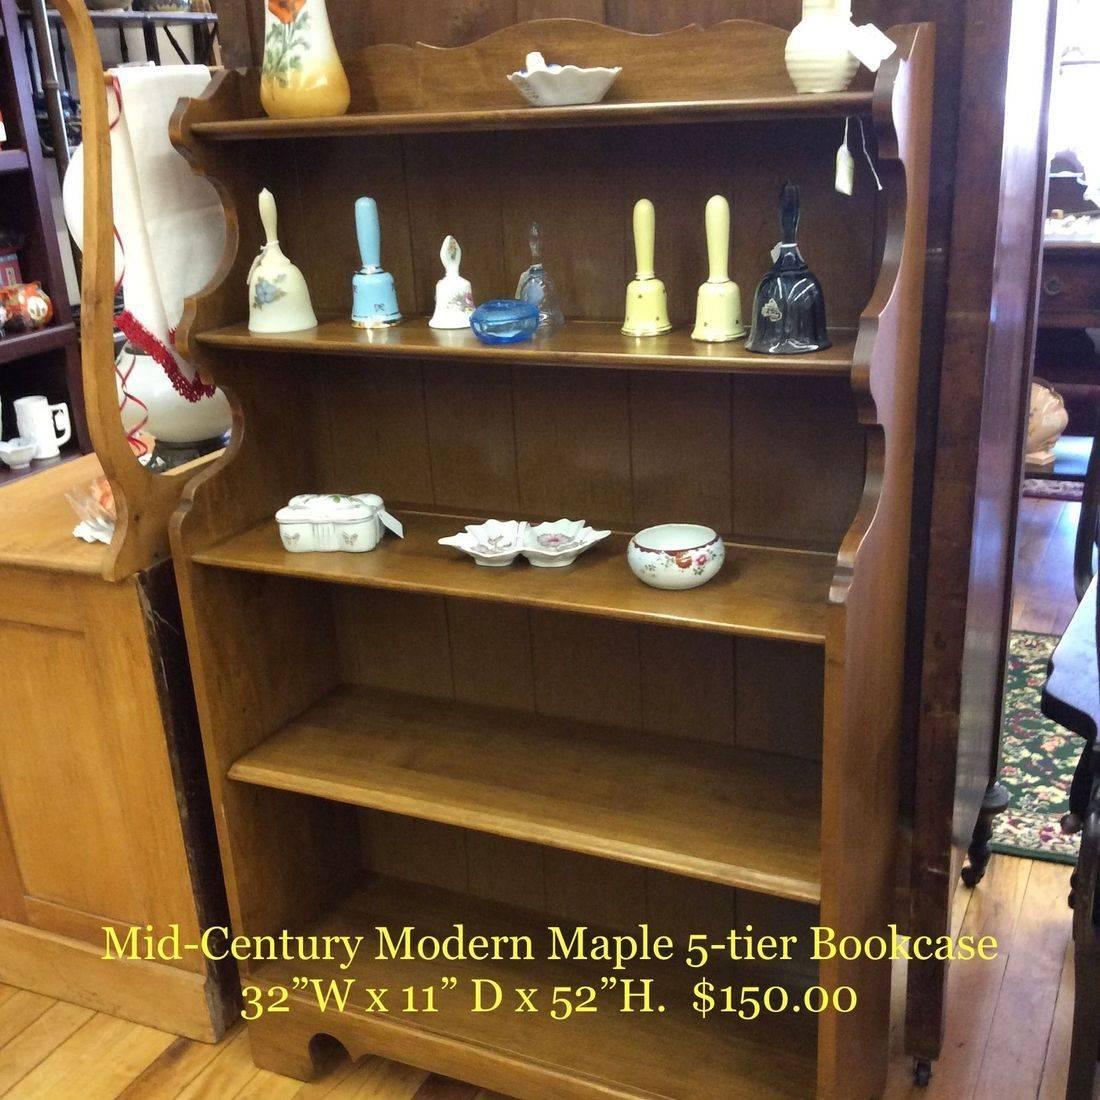 "Mid Century Modern Maple 5-tier Bookcase w/Adjustable Shelf  32""W x 11-1/4""D x 52""H   $150.00"